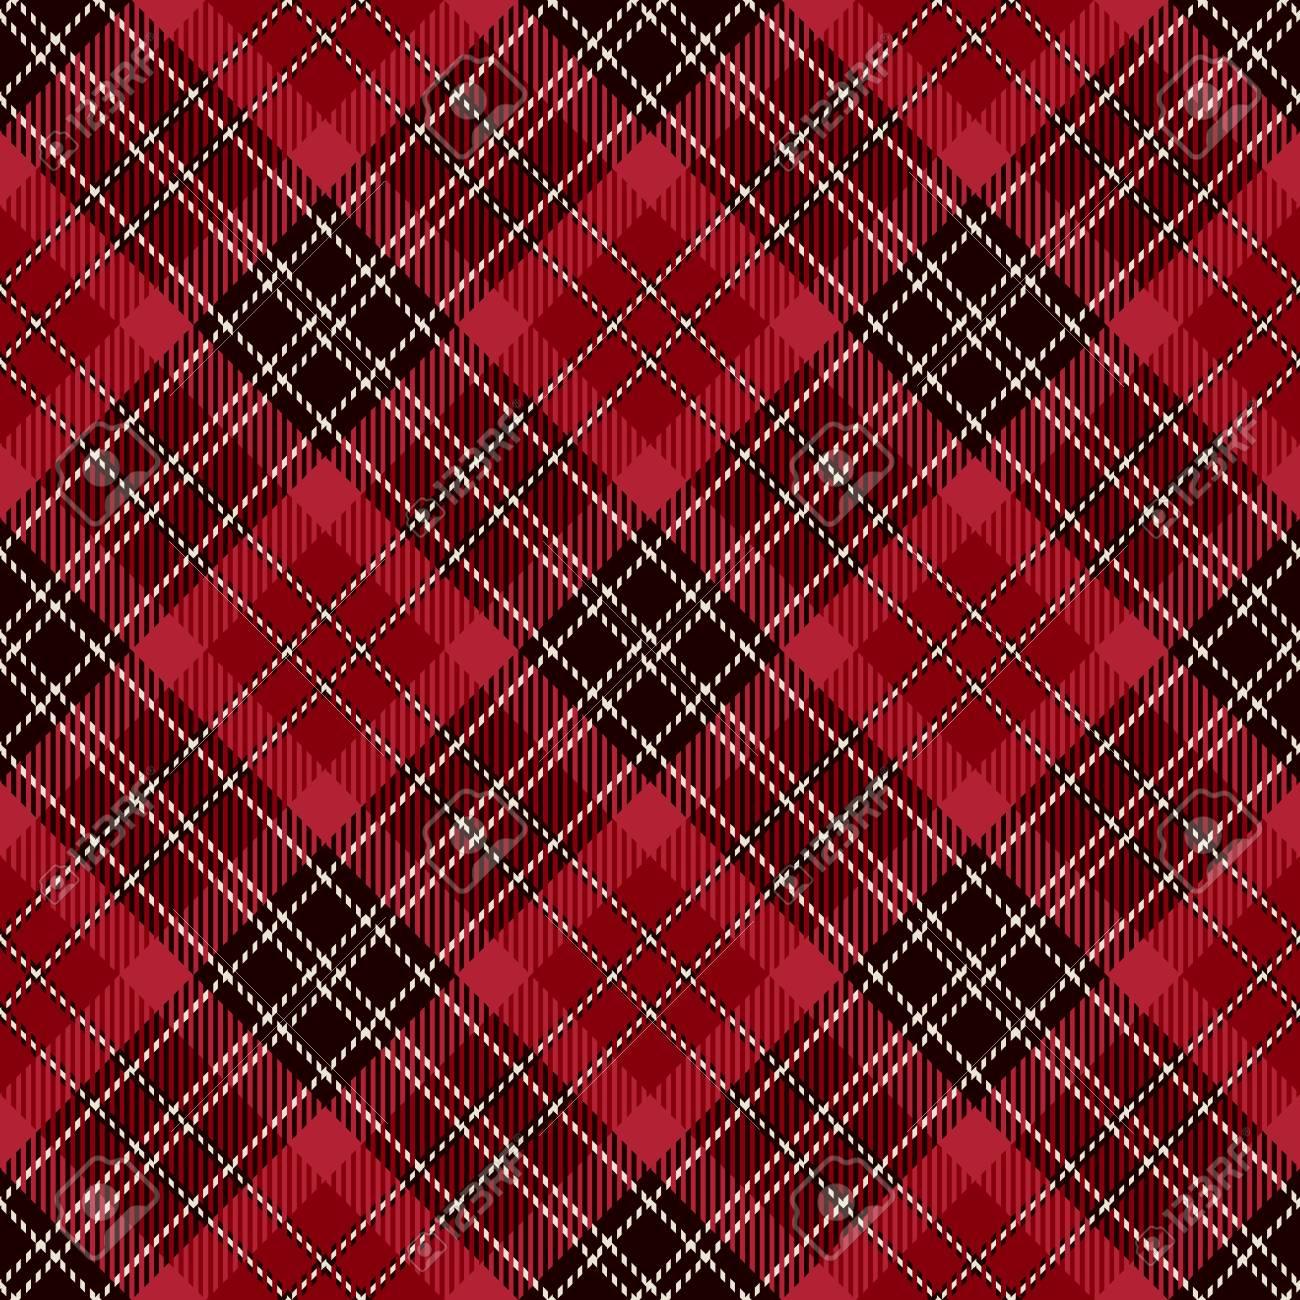 Tartan Seamless Pattern Background Red Black And White Plaid